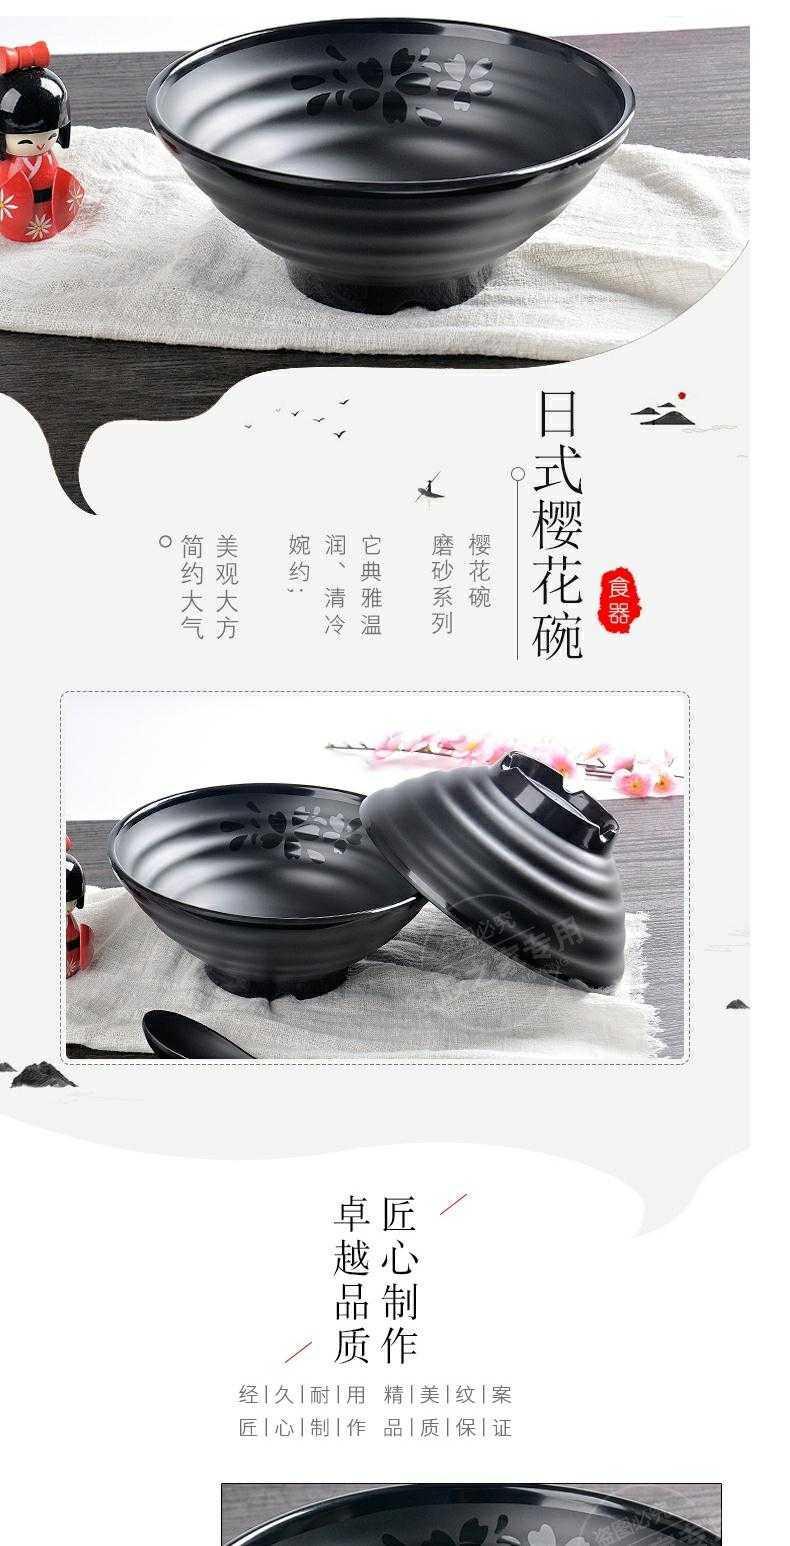 Stewed noodles bowls of black plastic bowls of imitation porcelain powder grinding rice such as beef Japanese ltd. drop melamine bowl of soup